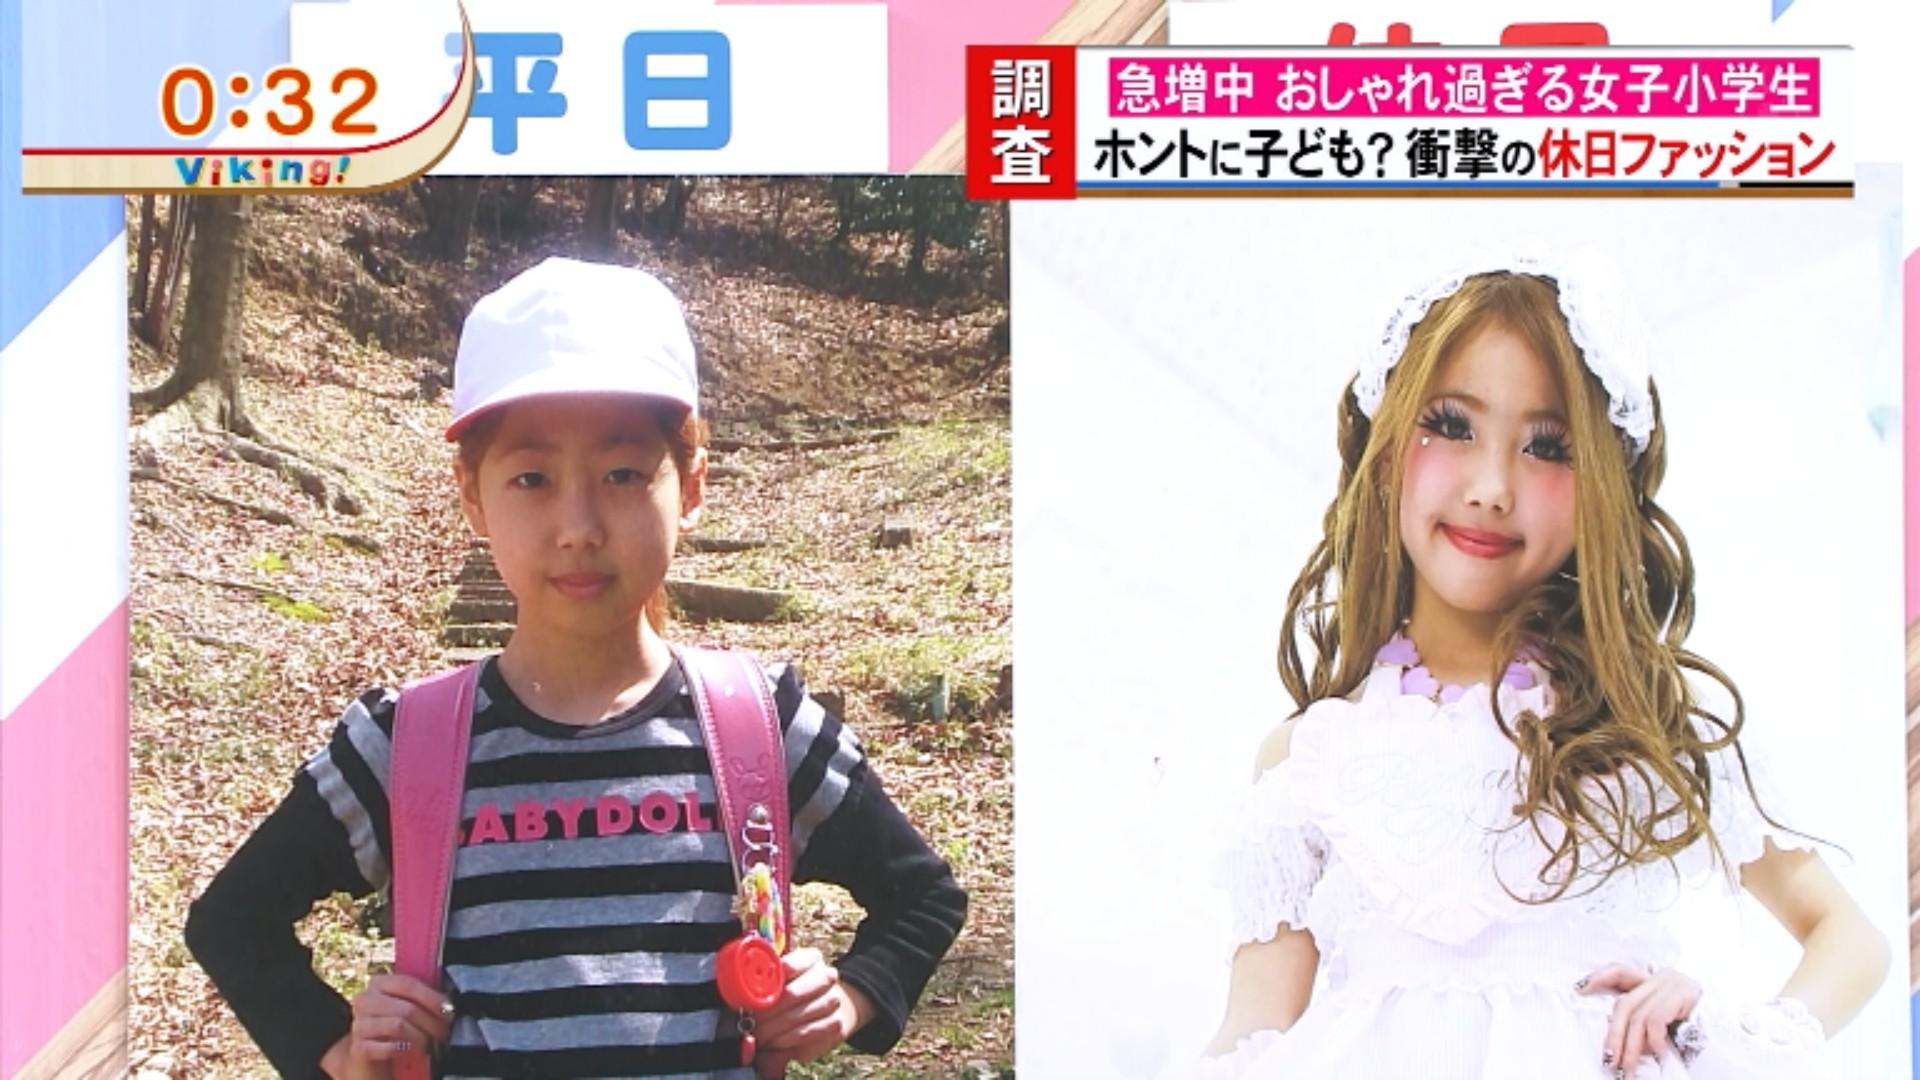 http://livedoor.blogimg.jp/hamusoku/imgs/5/9/59f0711c.jpg